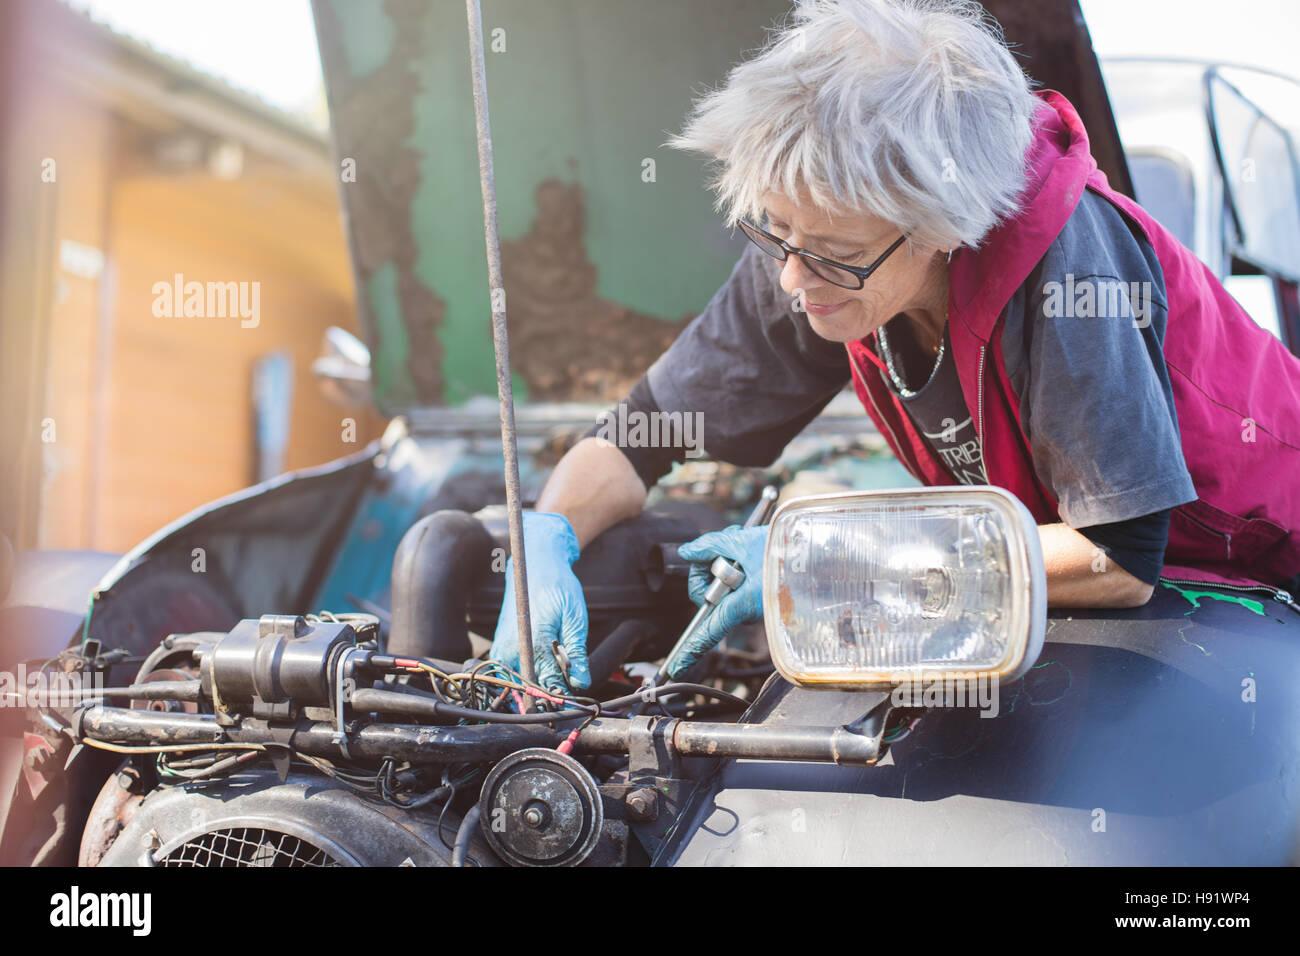 Elderly car mechanic working on her vintage car - Stock Image